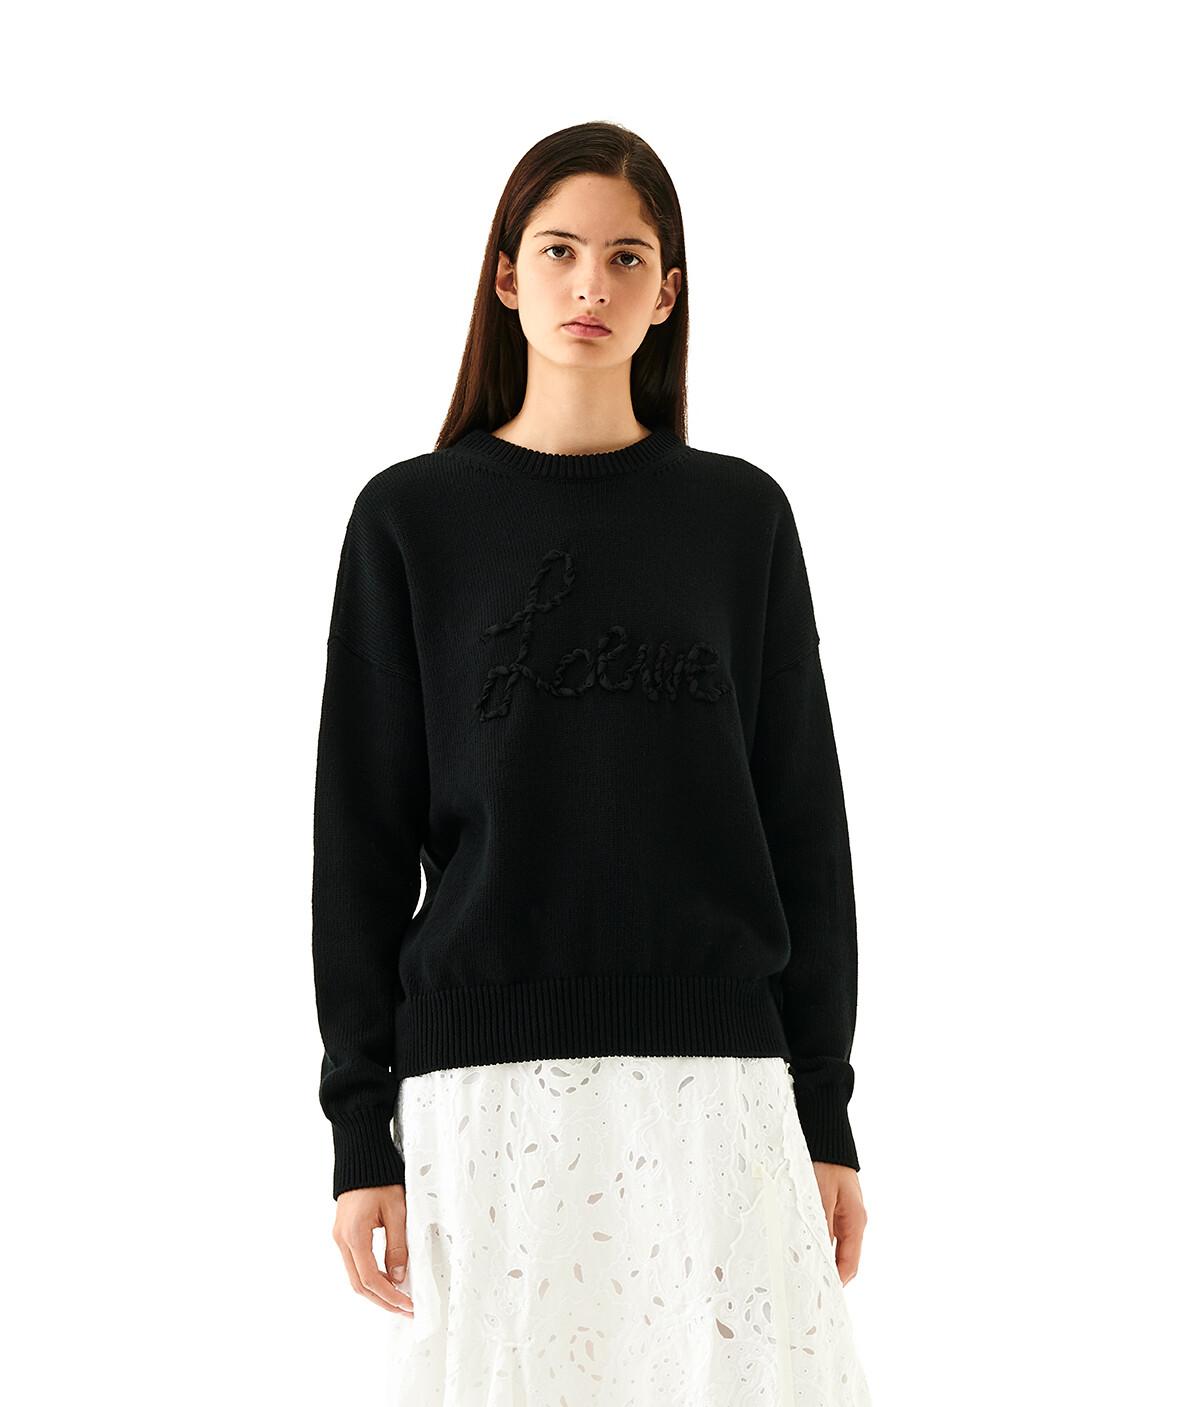 LOEWE Loewe Stitch Sweater Negro front